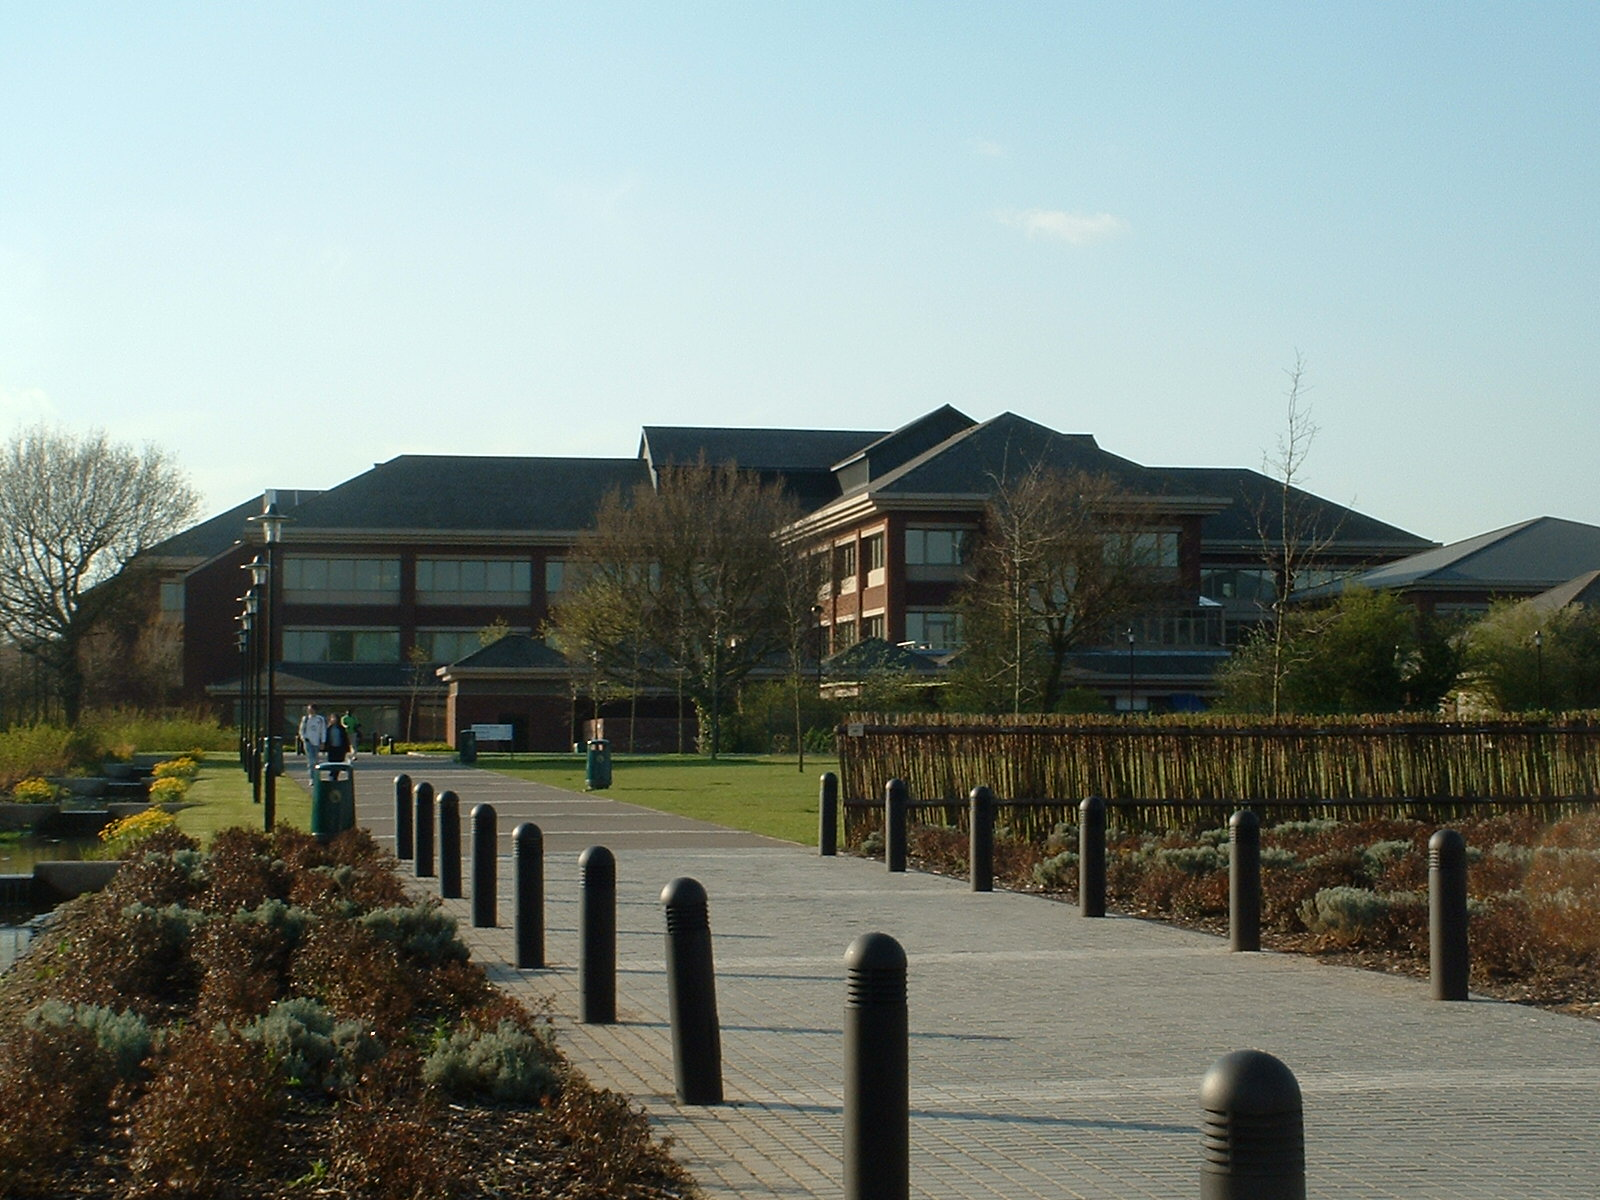 image of University of Warwick